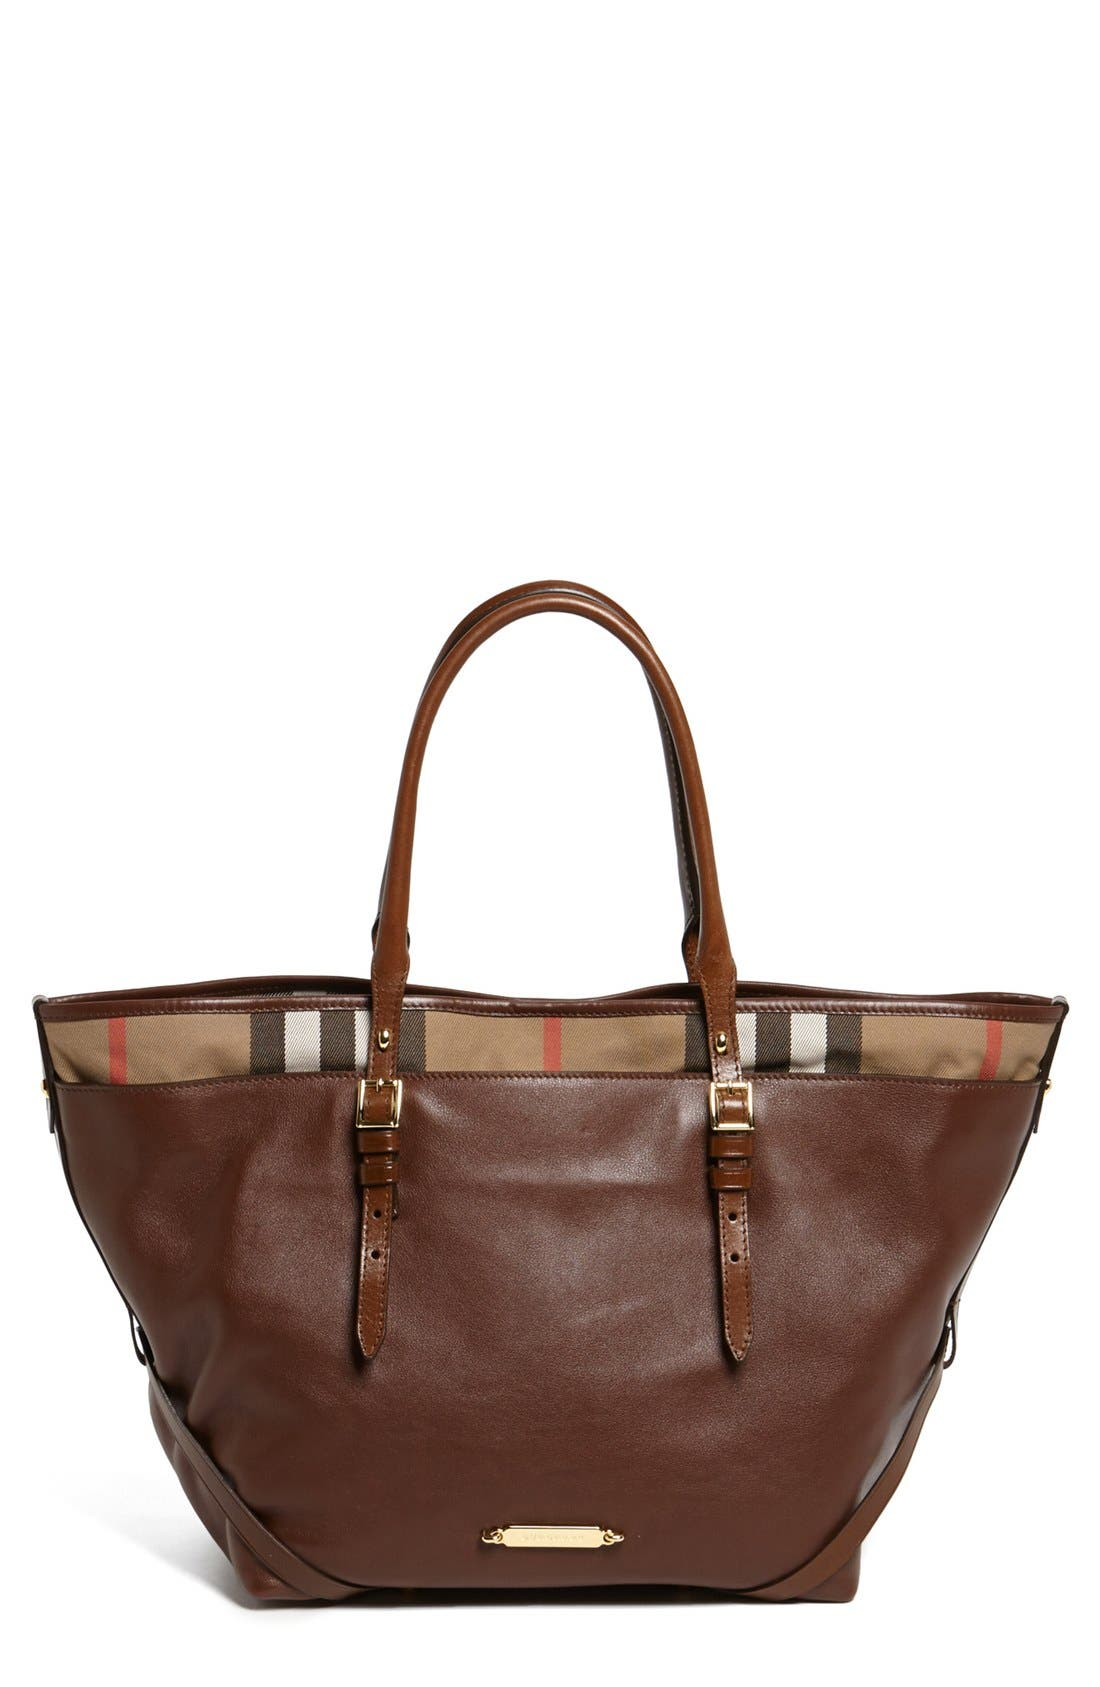 Alternate Image 1 Selected - Burberry 'Medium Salisbury' Leather Tote